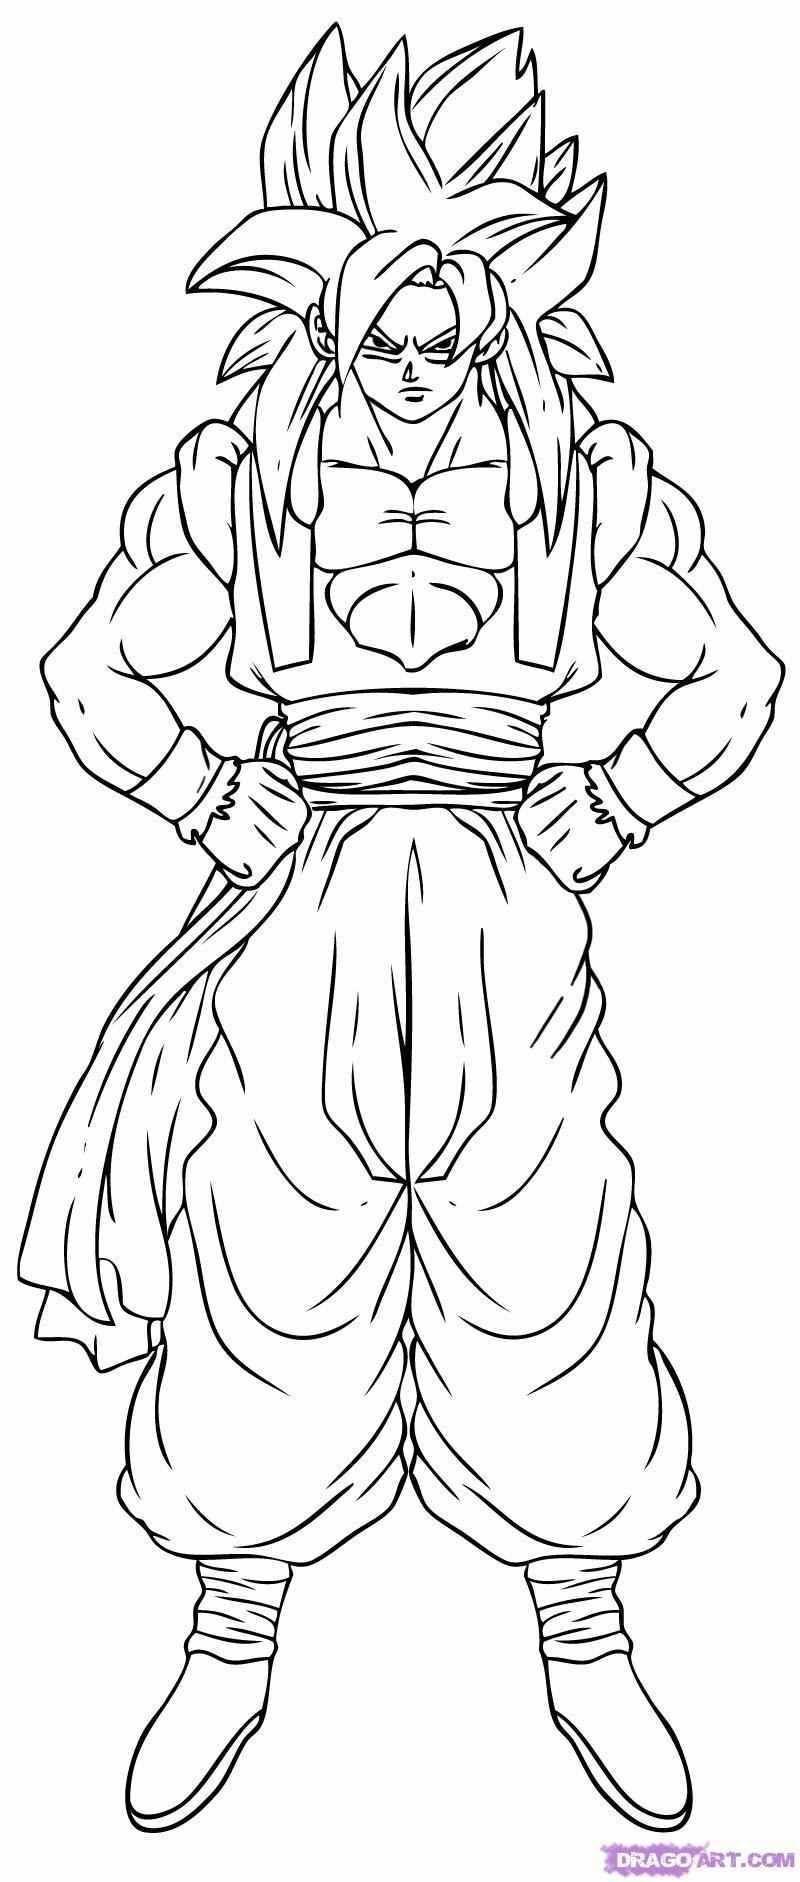 Dragon Ball Z Coloring Pages Goku Super Saiyan 3 Collection